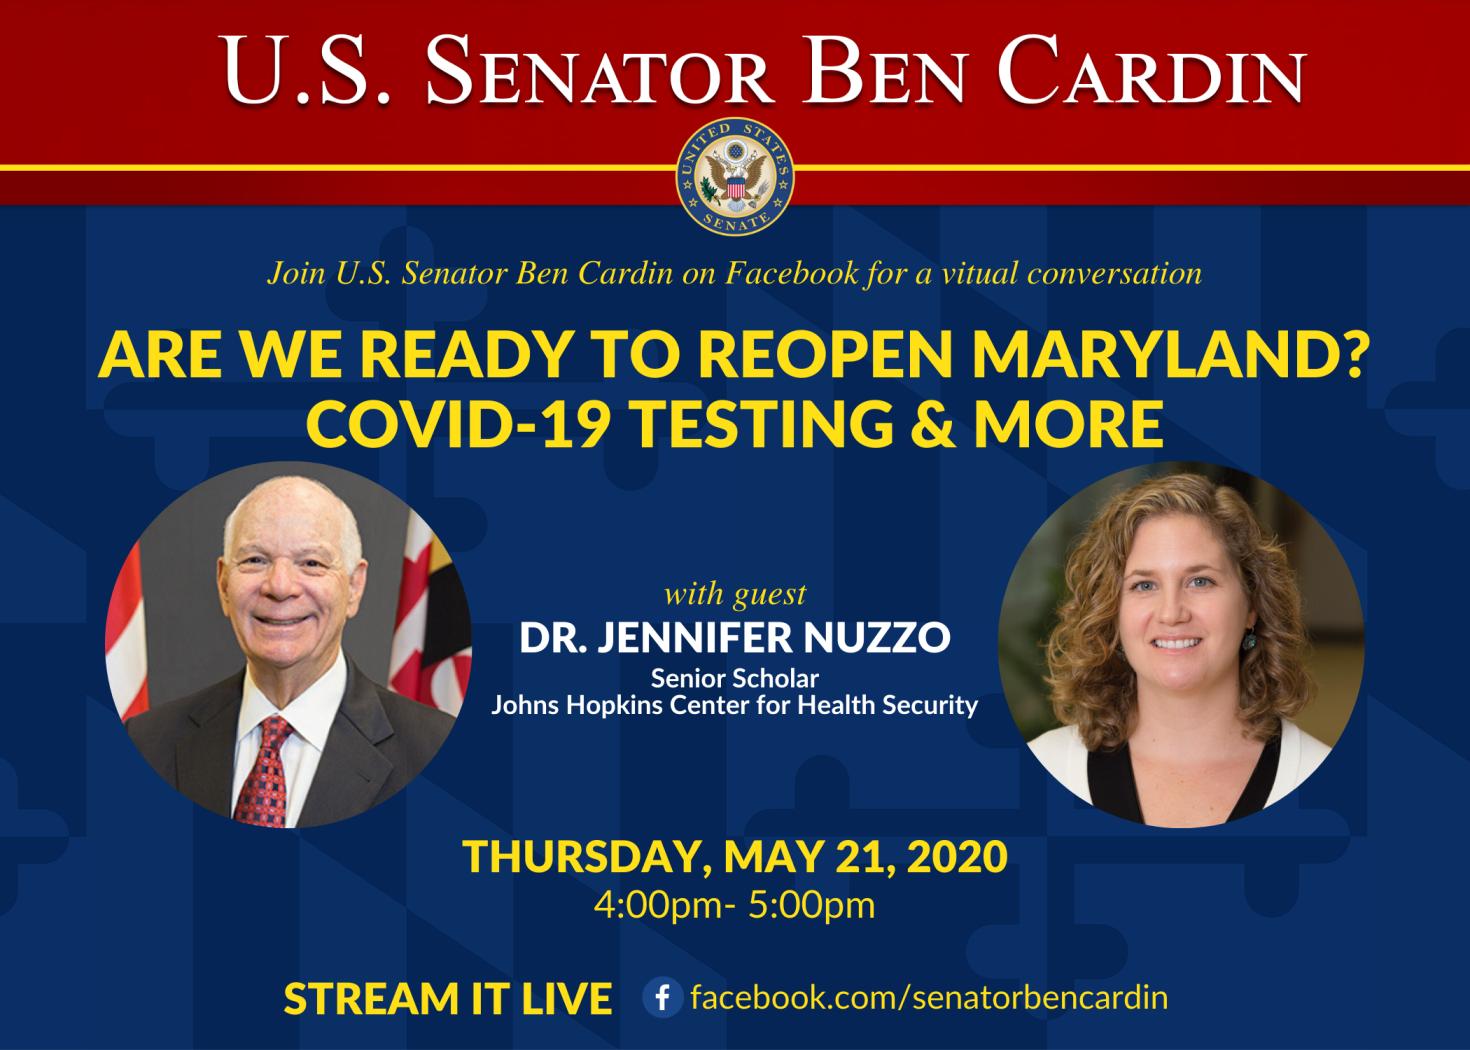 Senator Ben Cardin FB Live